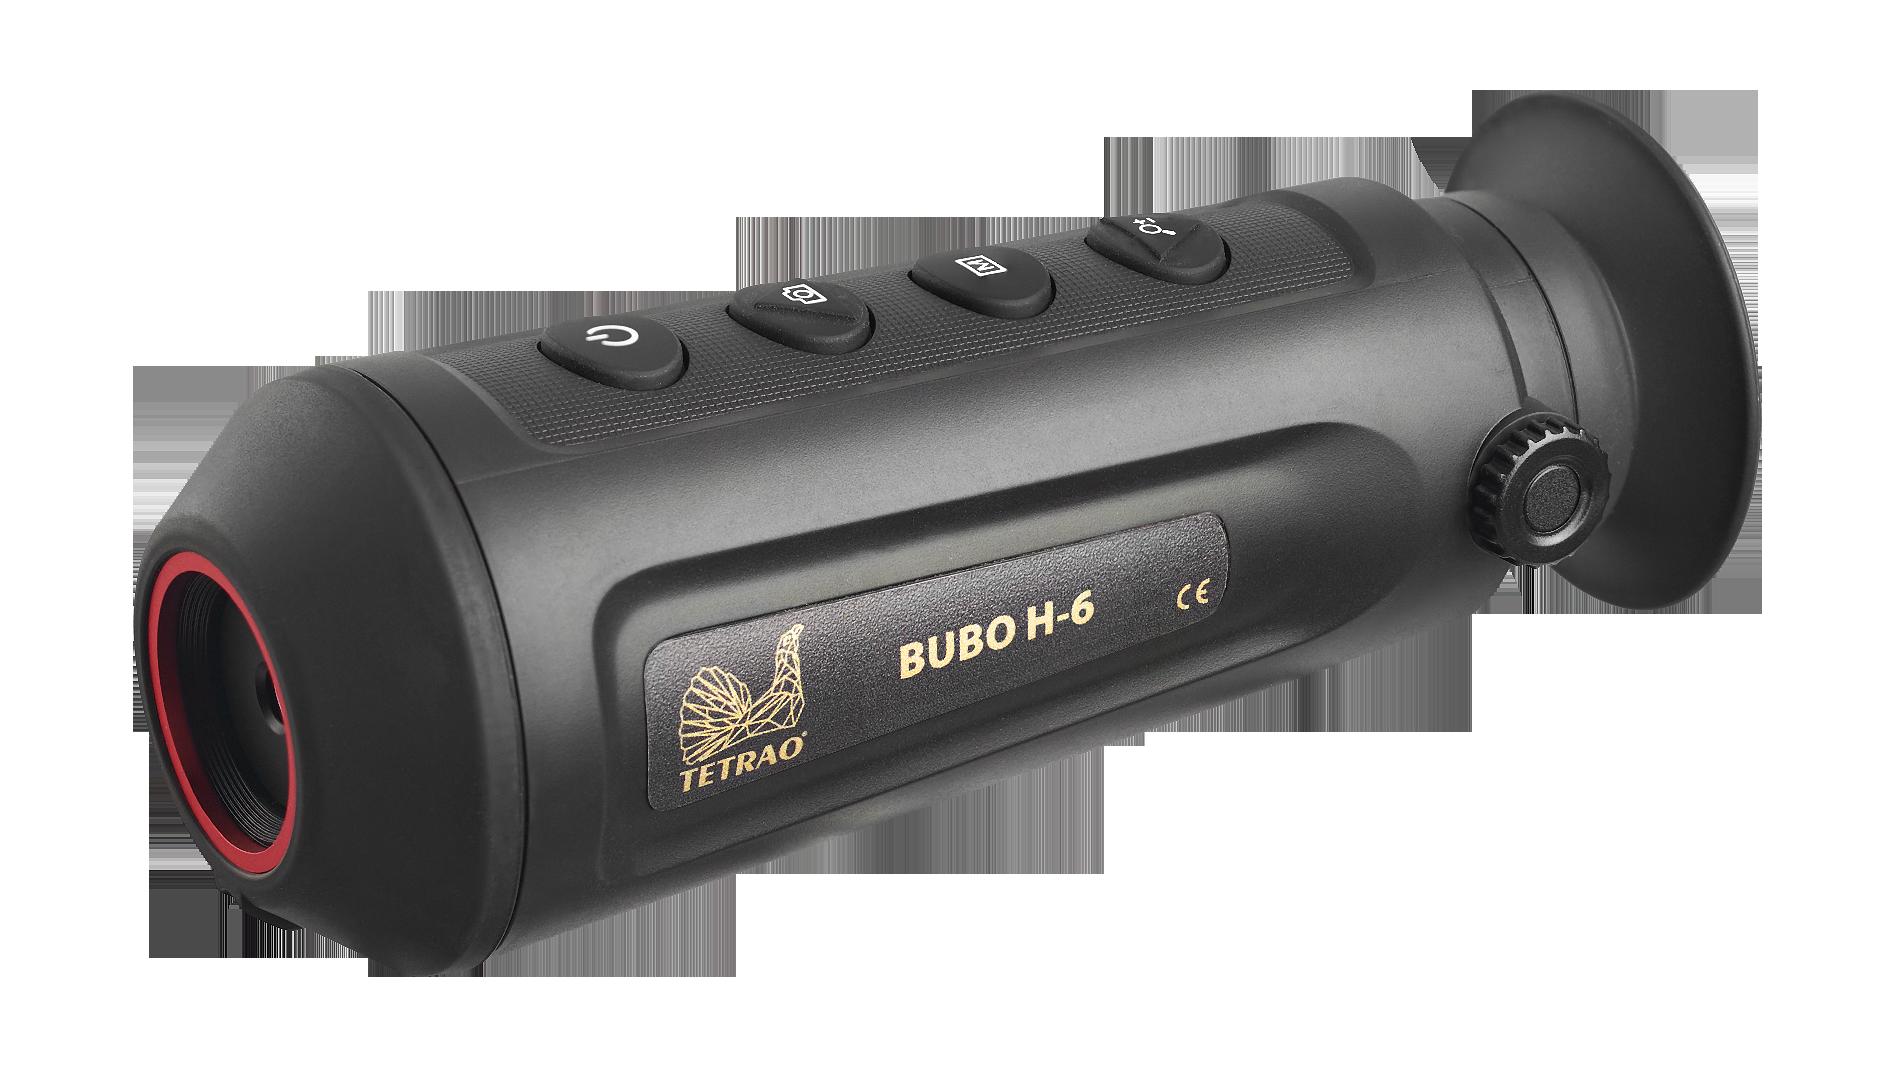 Termovízia TETRAO Bubo H-6 Wi-Fi 50Hz detekcia na 559 m